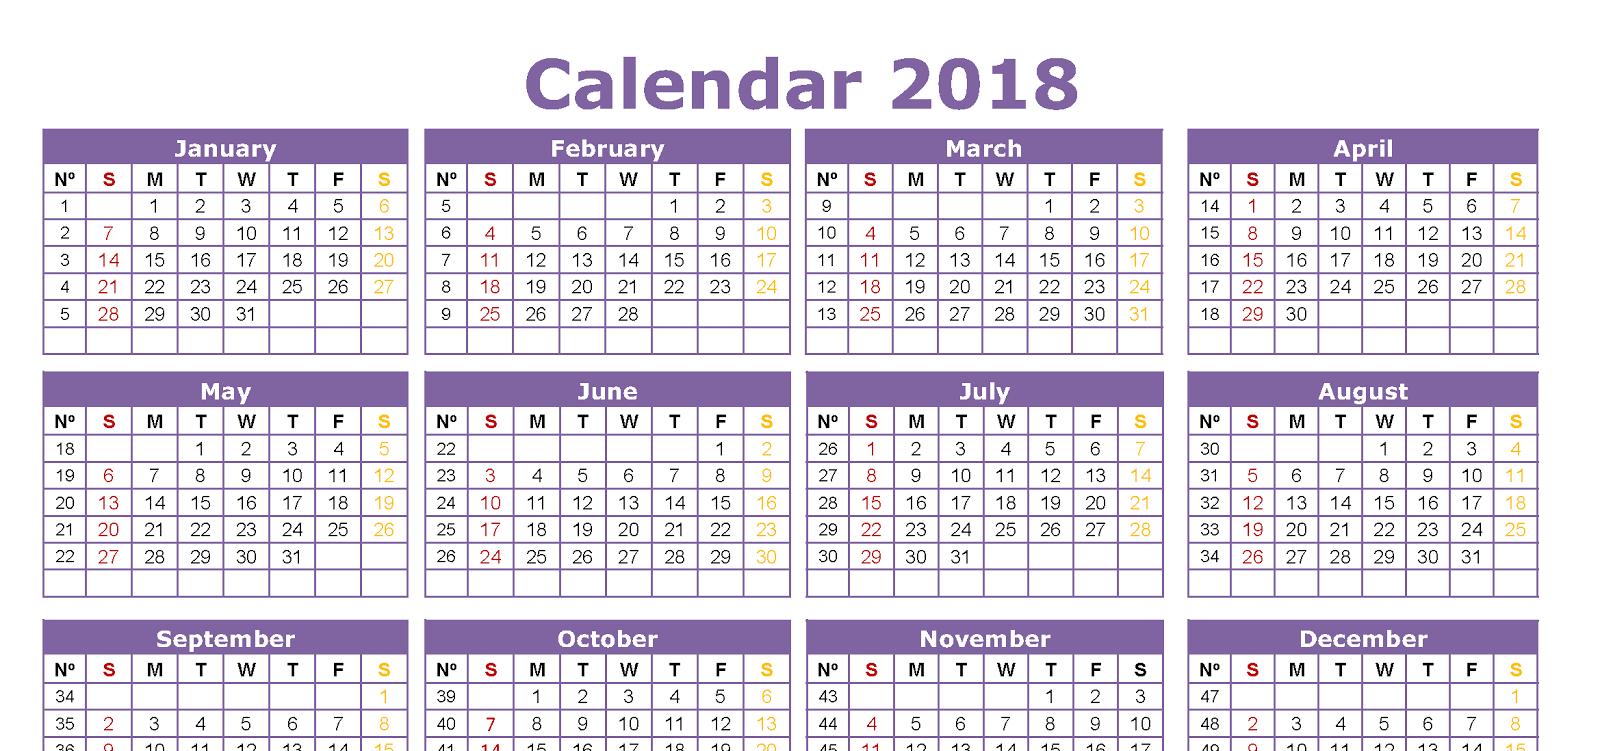 हिंदी कैलेंडर 2018 | Hindi Calendar 2018 Festivals & Holidays